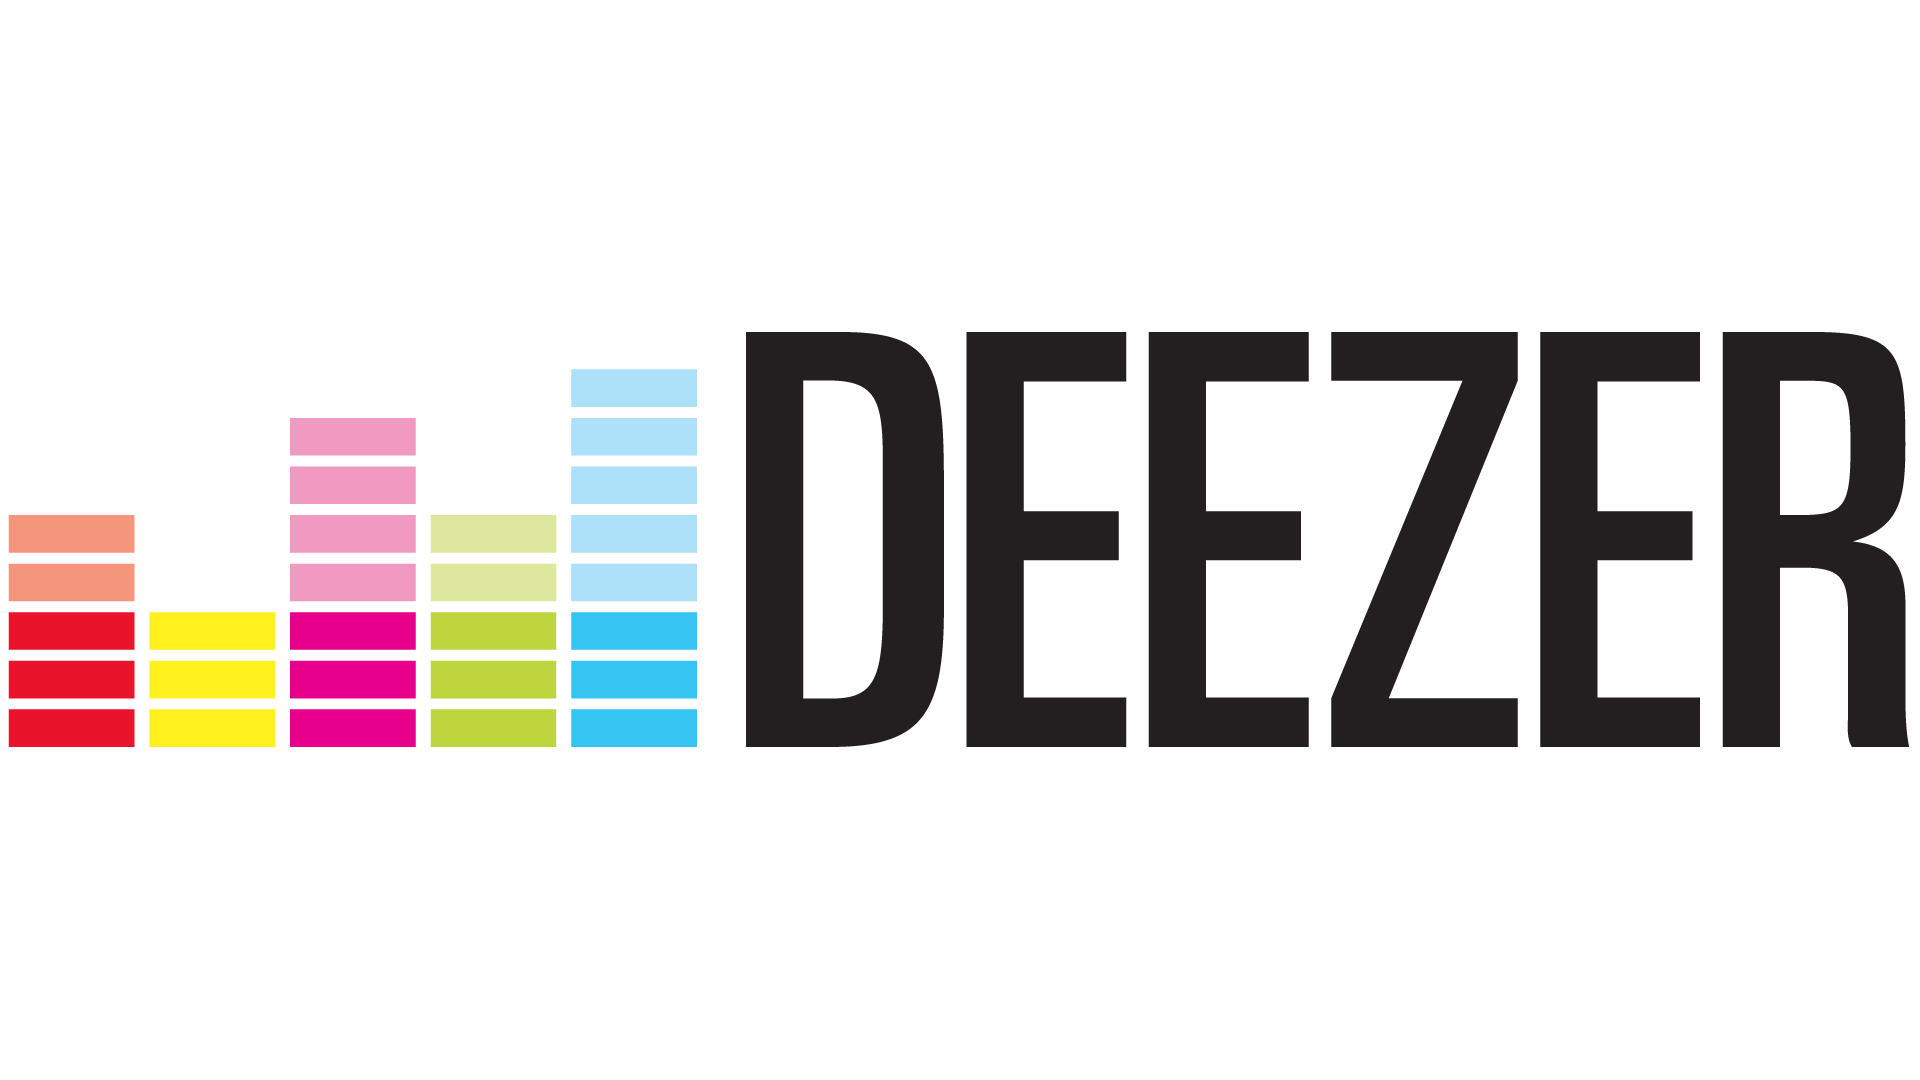 Deezer Podcast